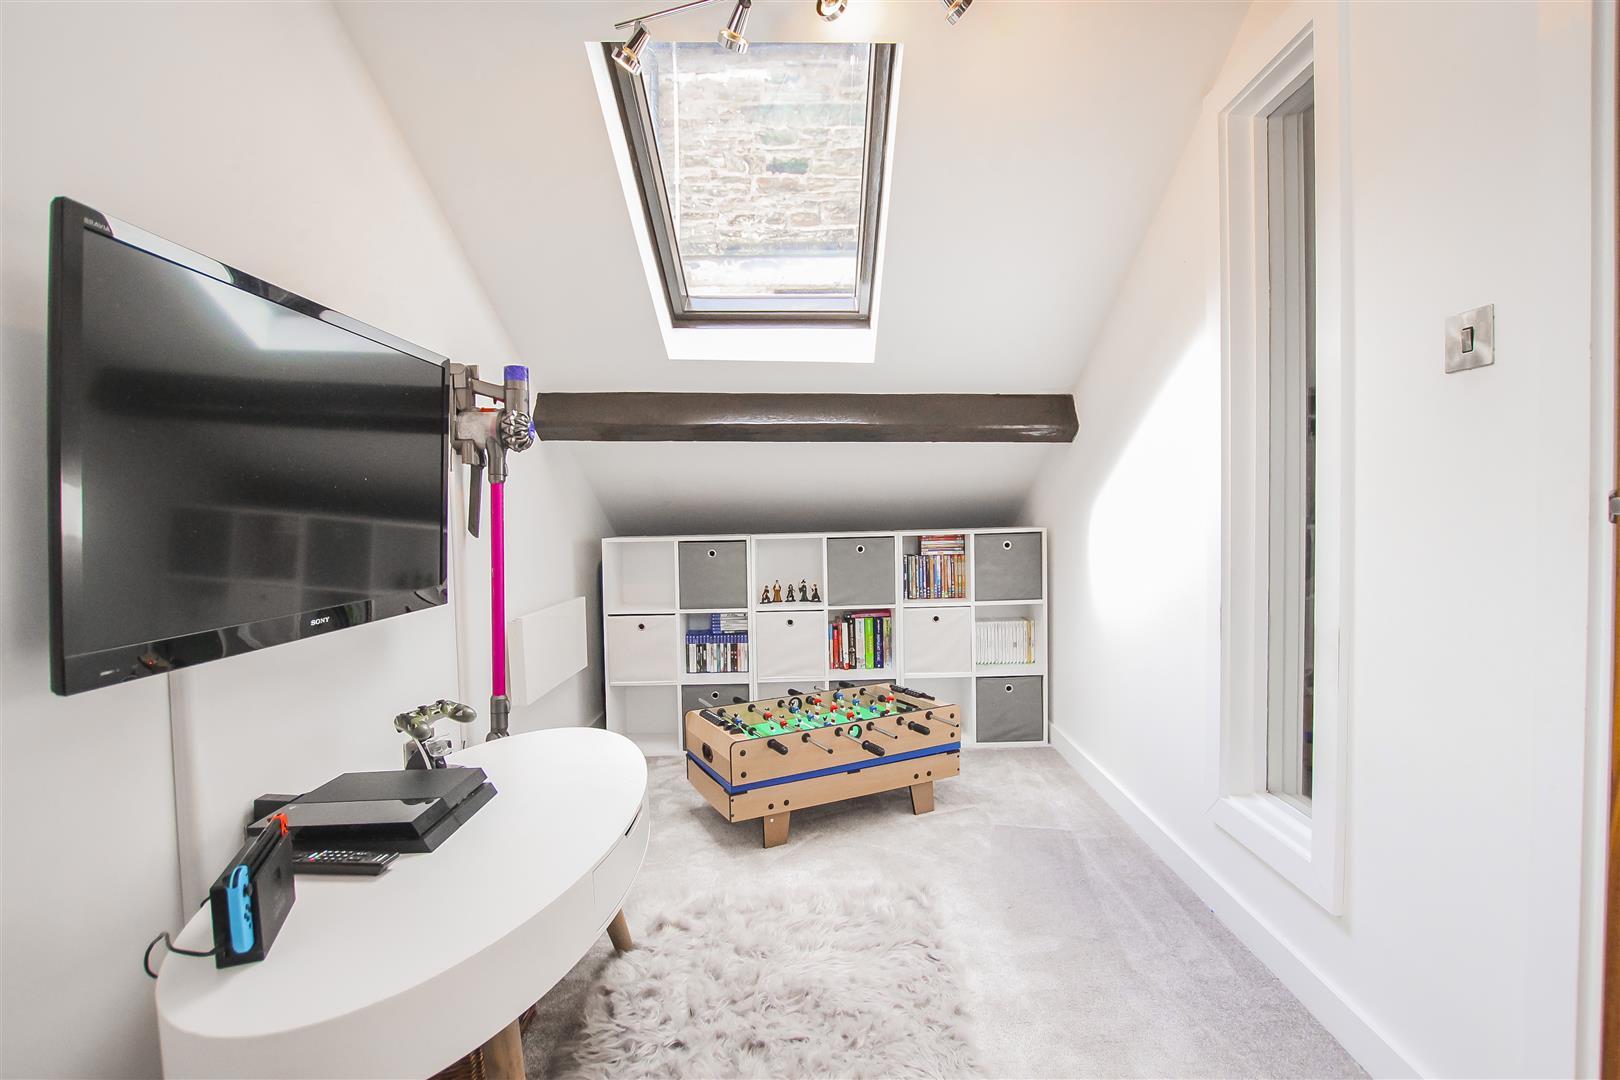 3 Bedroom Duplex Apartment For Sale - Image 45